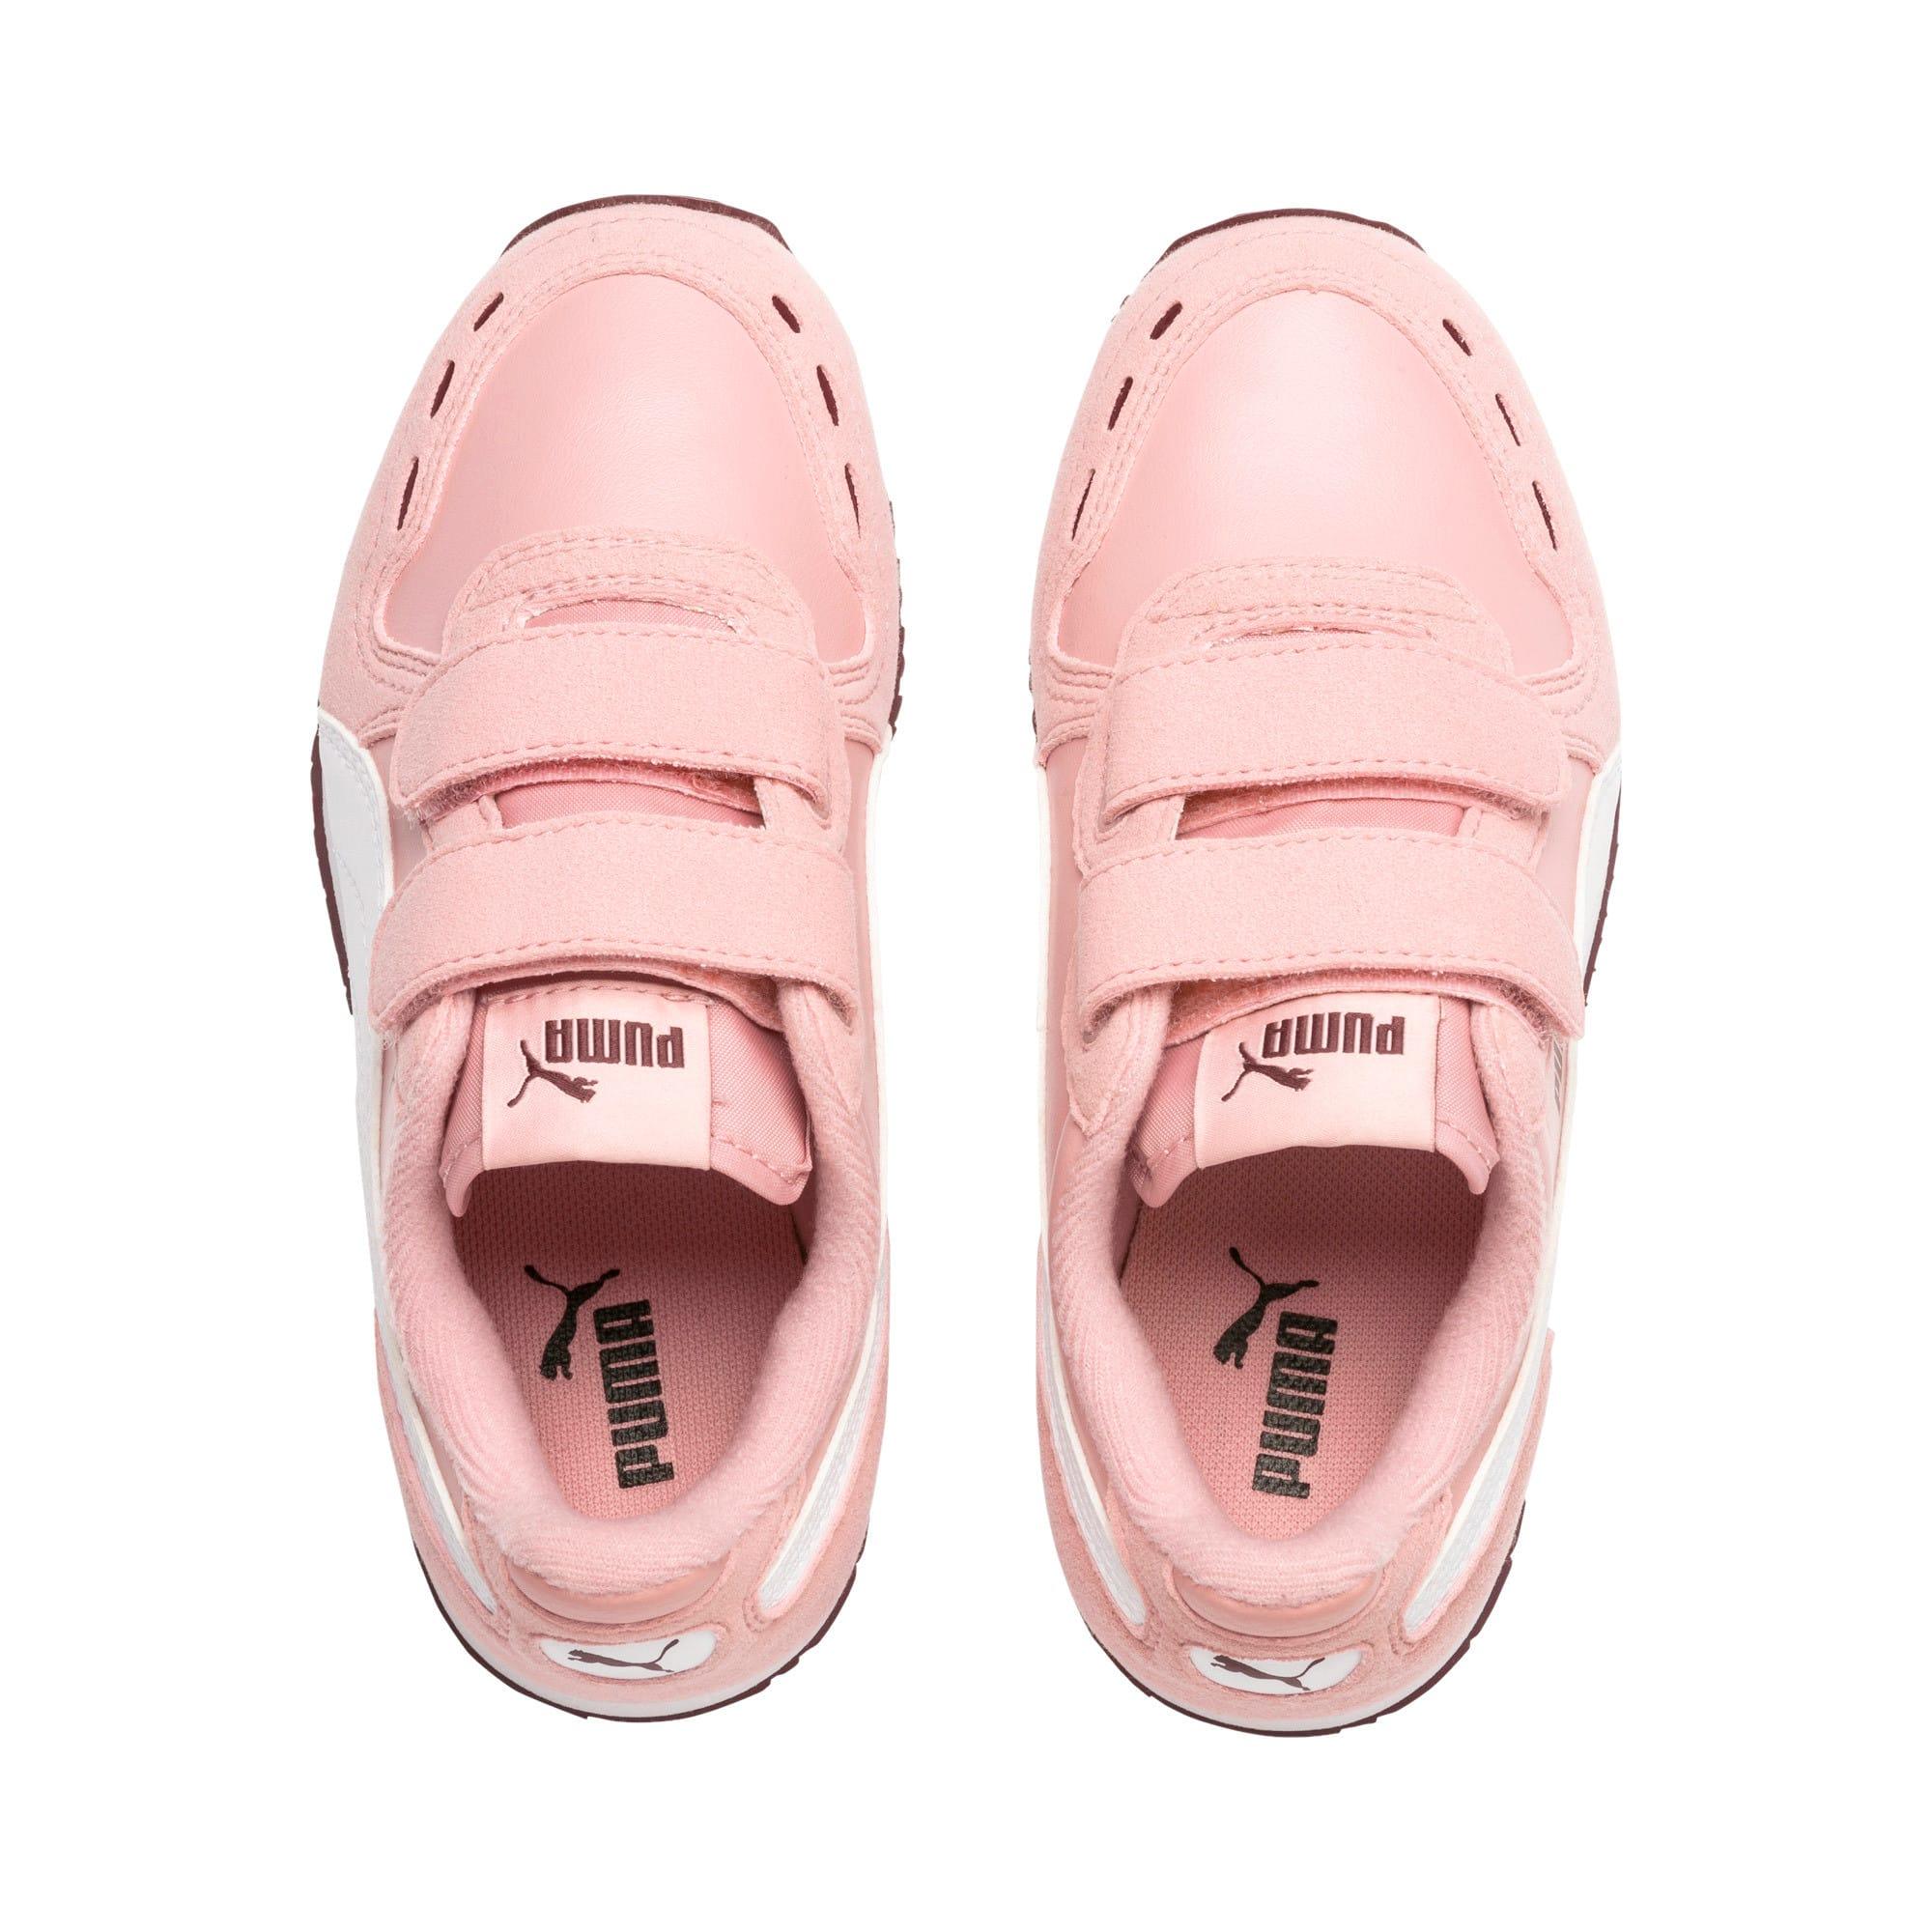 Thumbnail 6 of Cabana Racer SL V PS Baby Sneaker, Bridal Rose-Puma White, medium